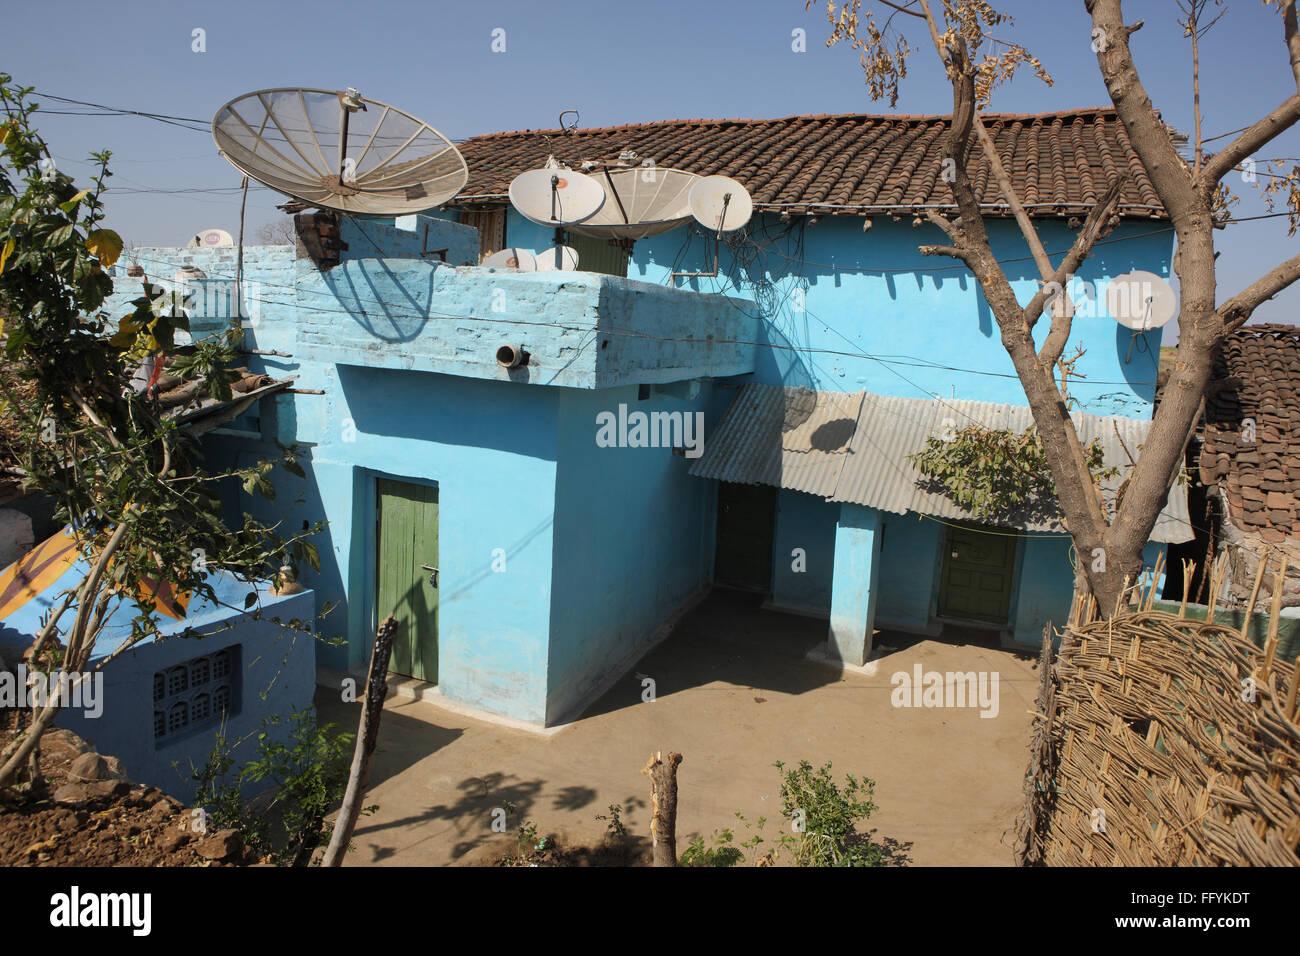 Parabolantennen in elektrifizierten Dörfern Mandla Madhya Pradesh, Indien Stockbild